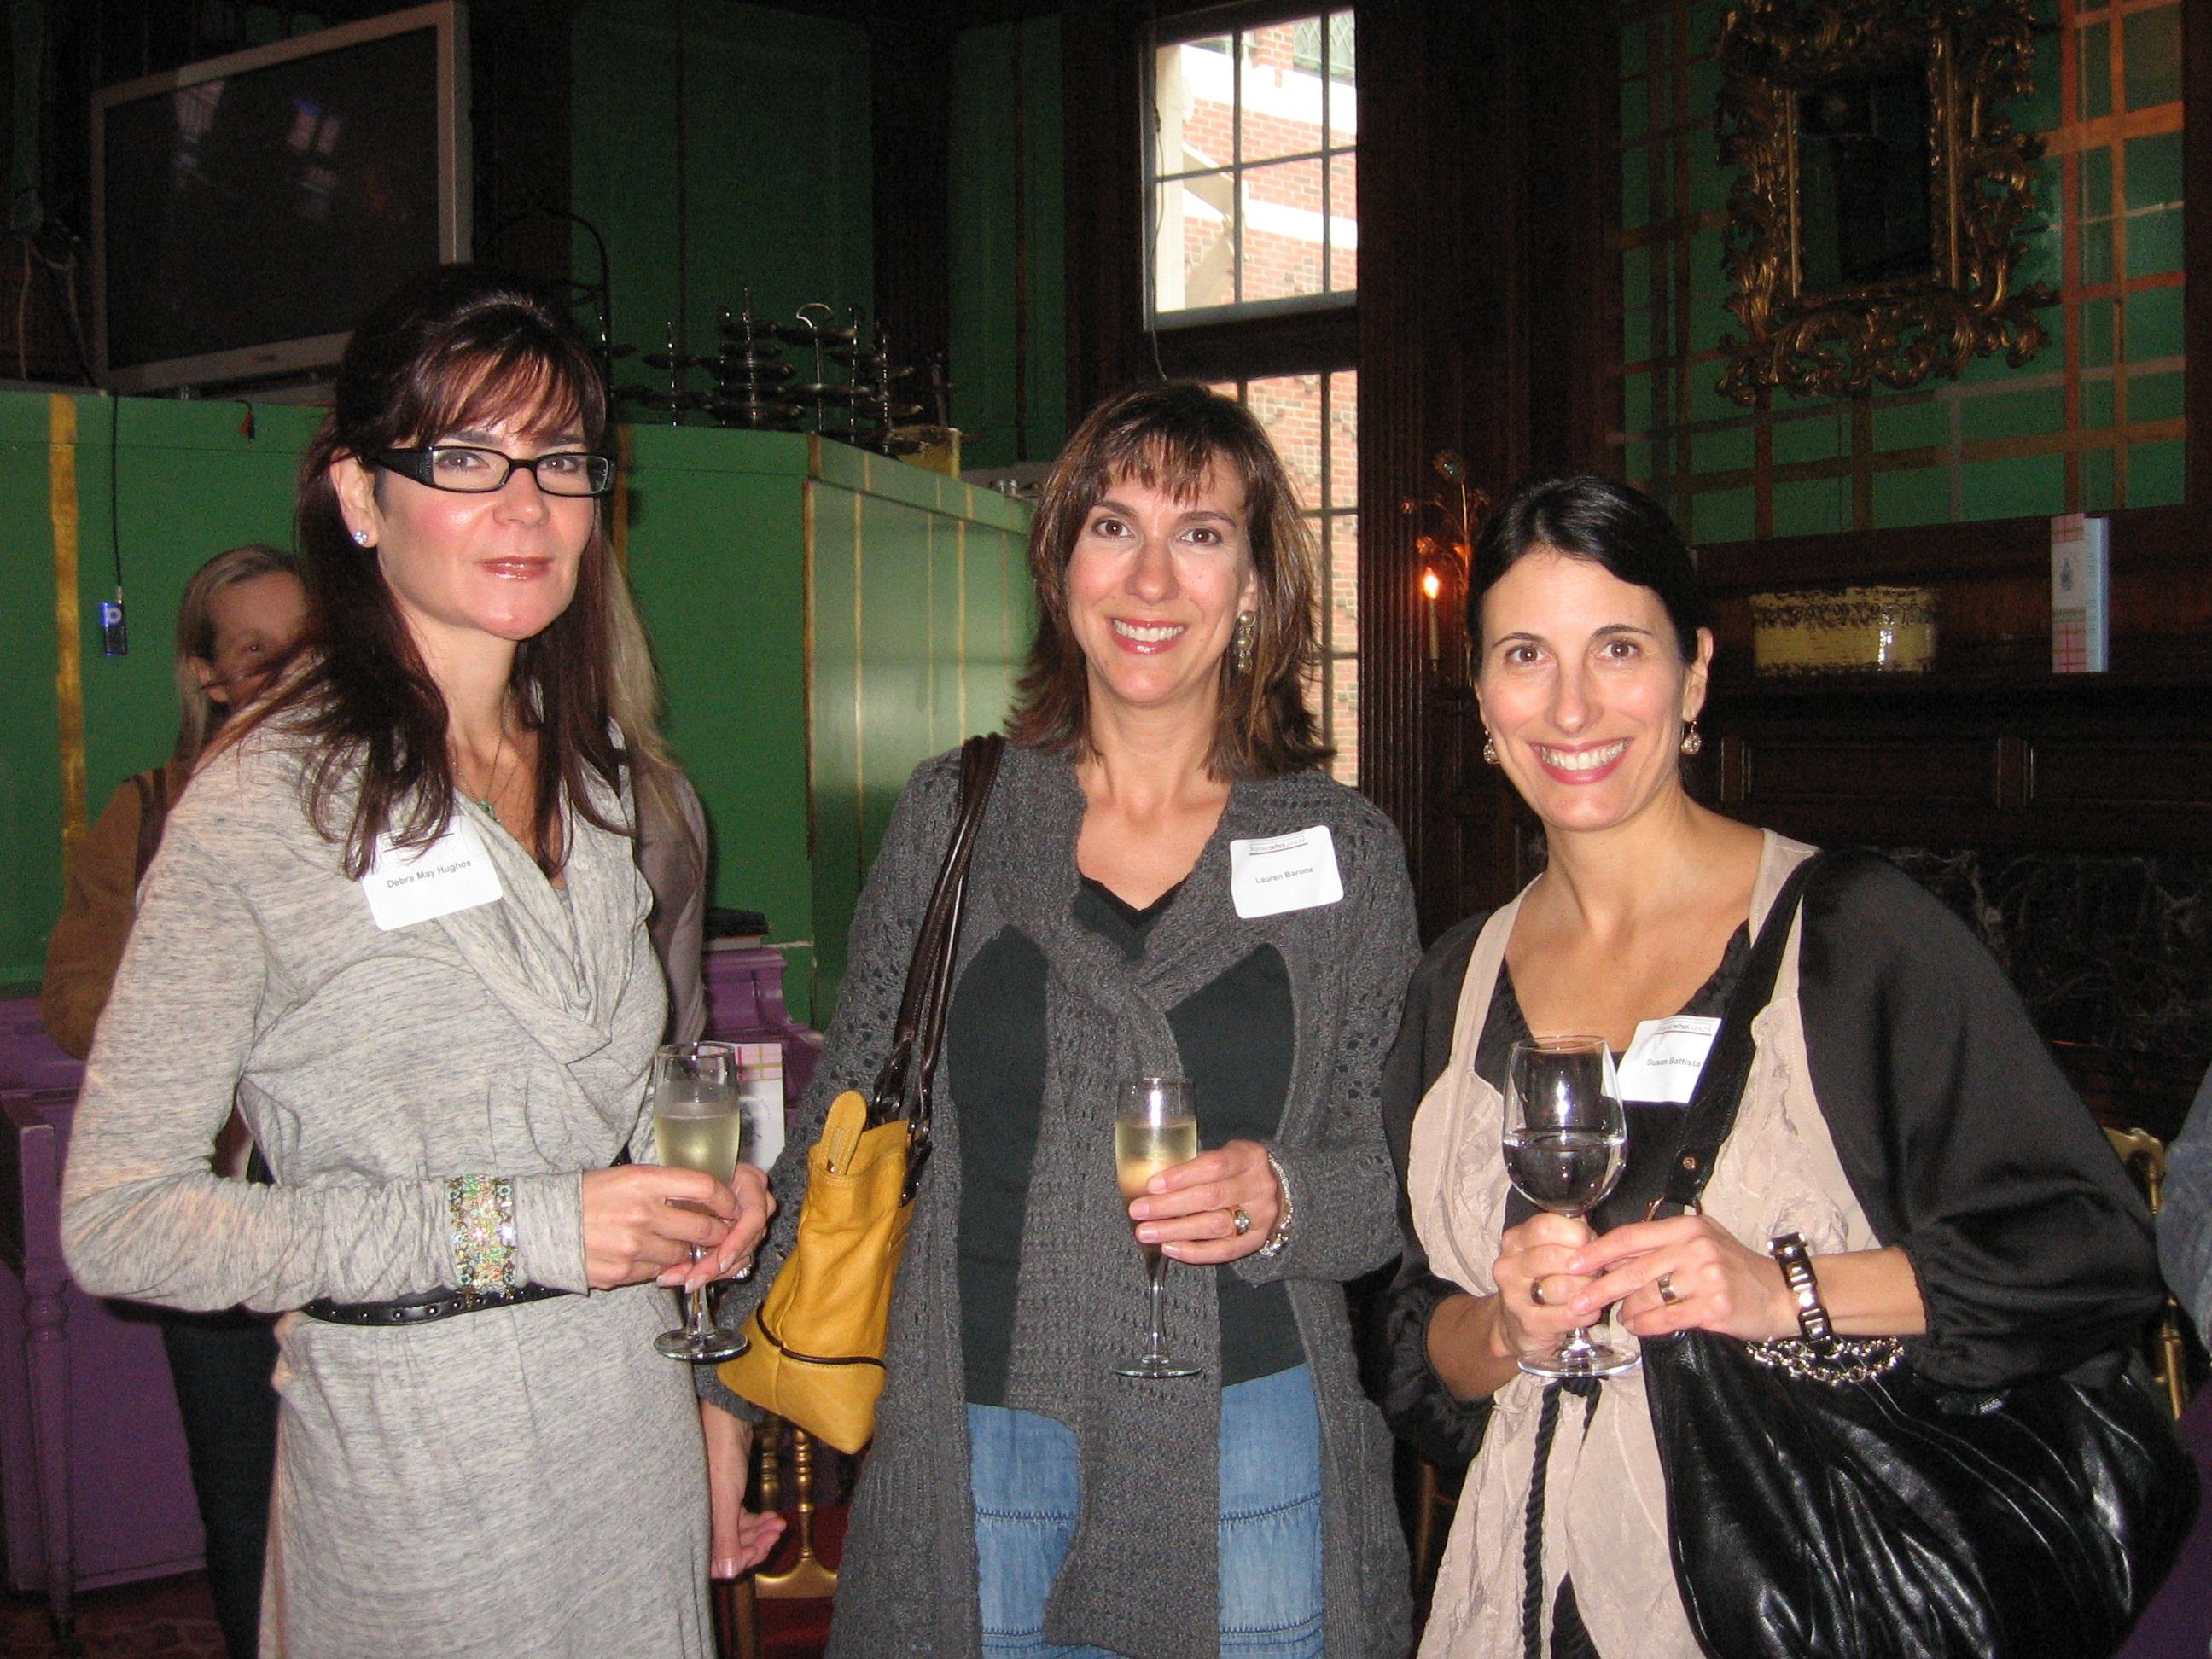 11-2011-Debra-May-Hughes-Lauren-Barrone-Susan-Battista.jpg